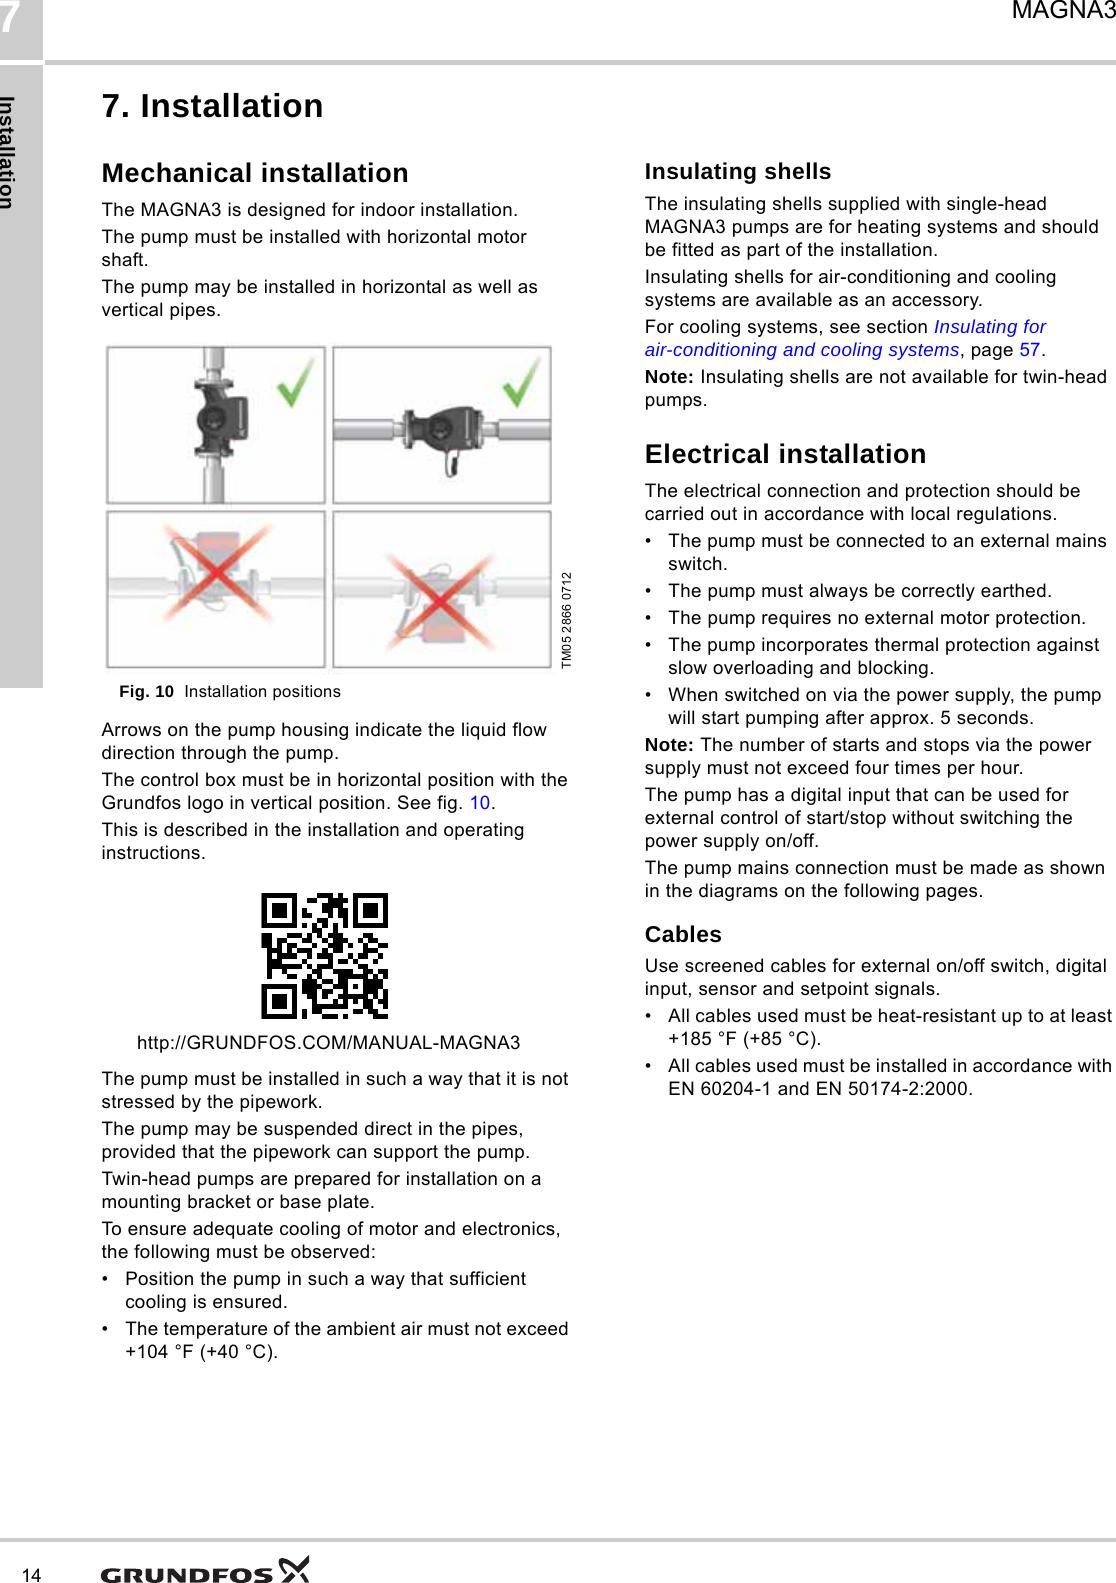 grundfos magna3 pump manual best pump 2018 rh trainselfs site Grundfos Magna 40 120 grundfos magna3 installation instructions